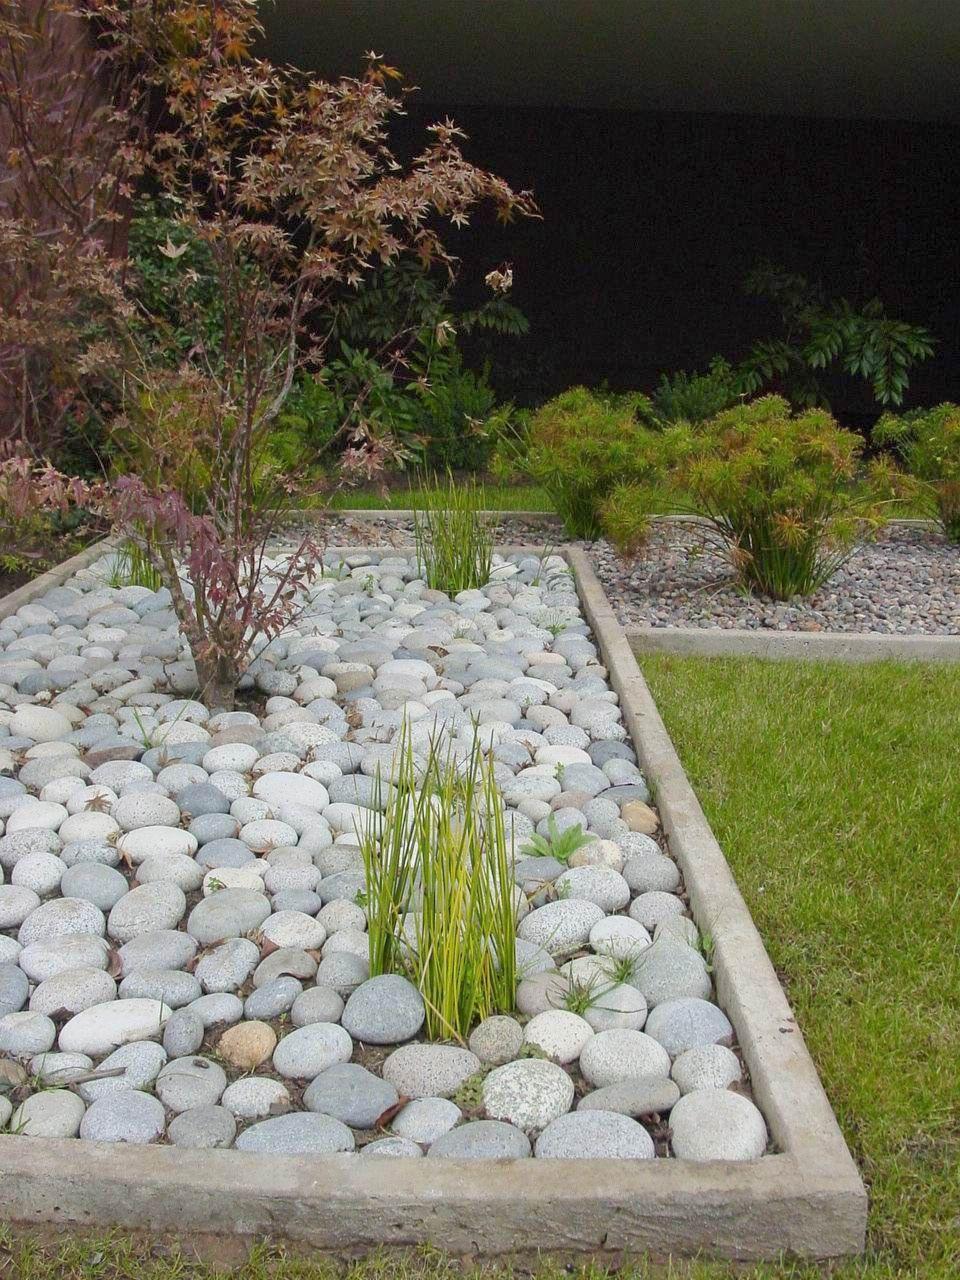 Bolon soledad astorquiza jardines jardines - Jardin decoracion exterior ...